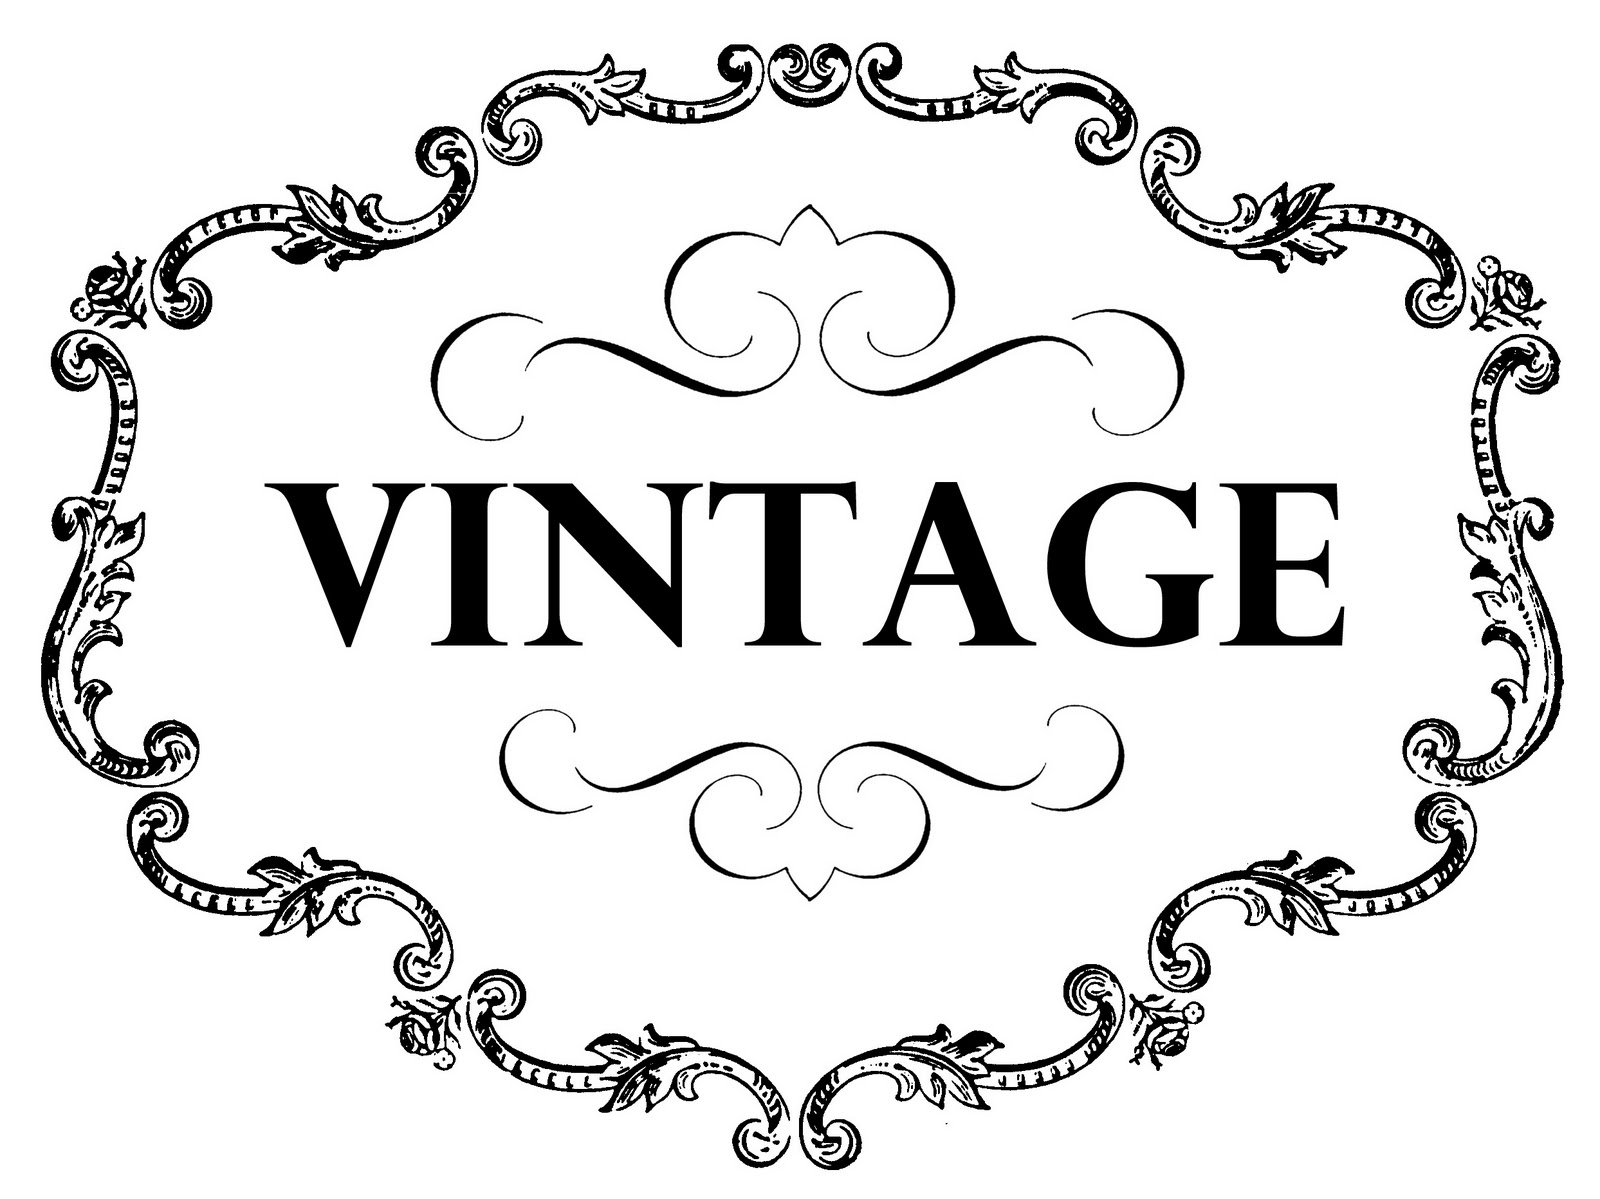 http://4.bp.blogspot.com/-2cZbbeTlfwk/Tw5ej6vHghI/AAAAAAAABqk/Dpj7mlJQqYI/s1600/vintage.jpg